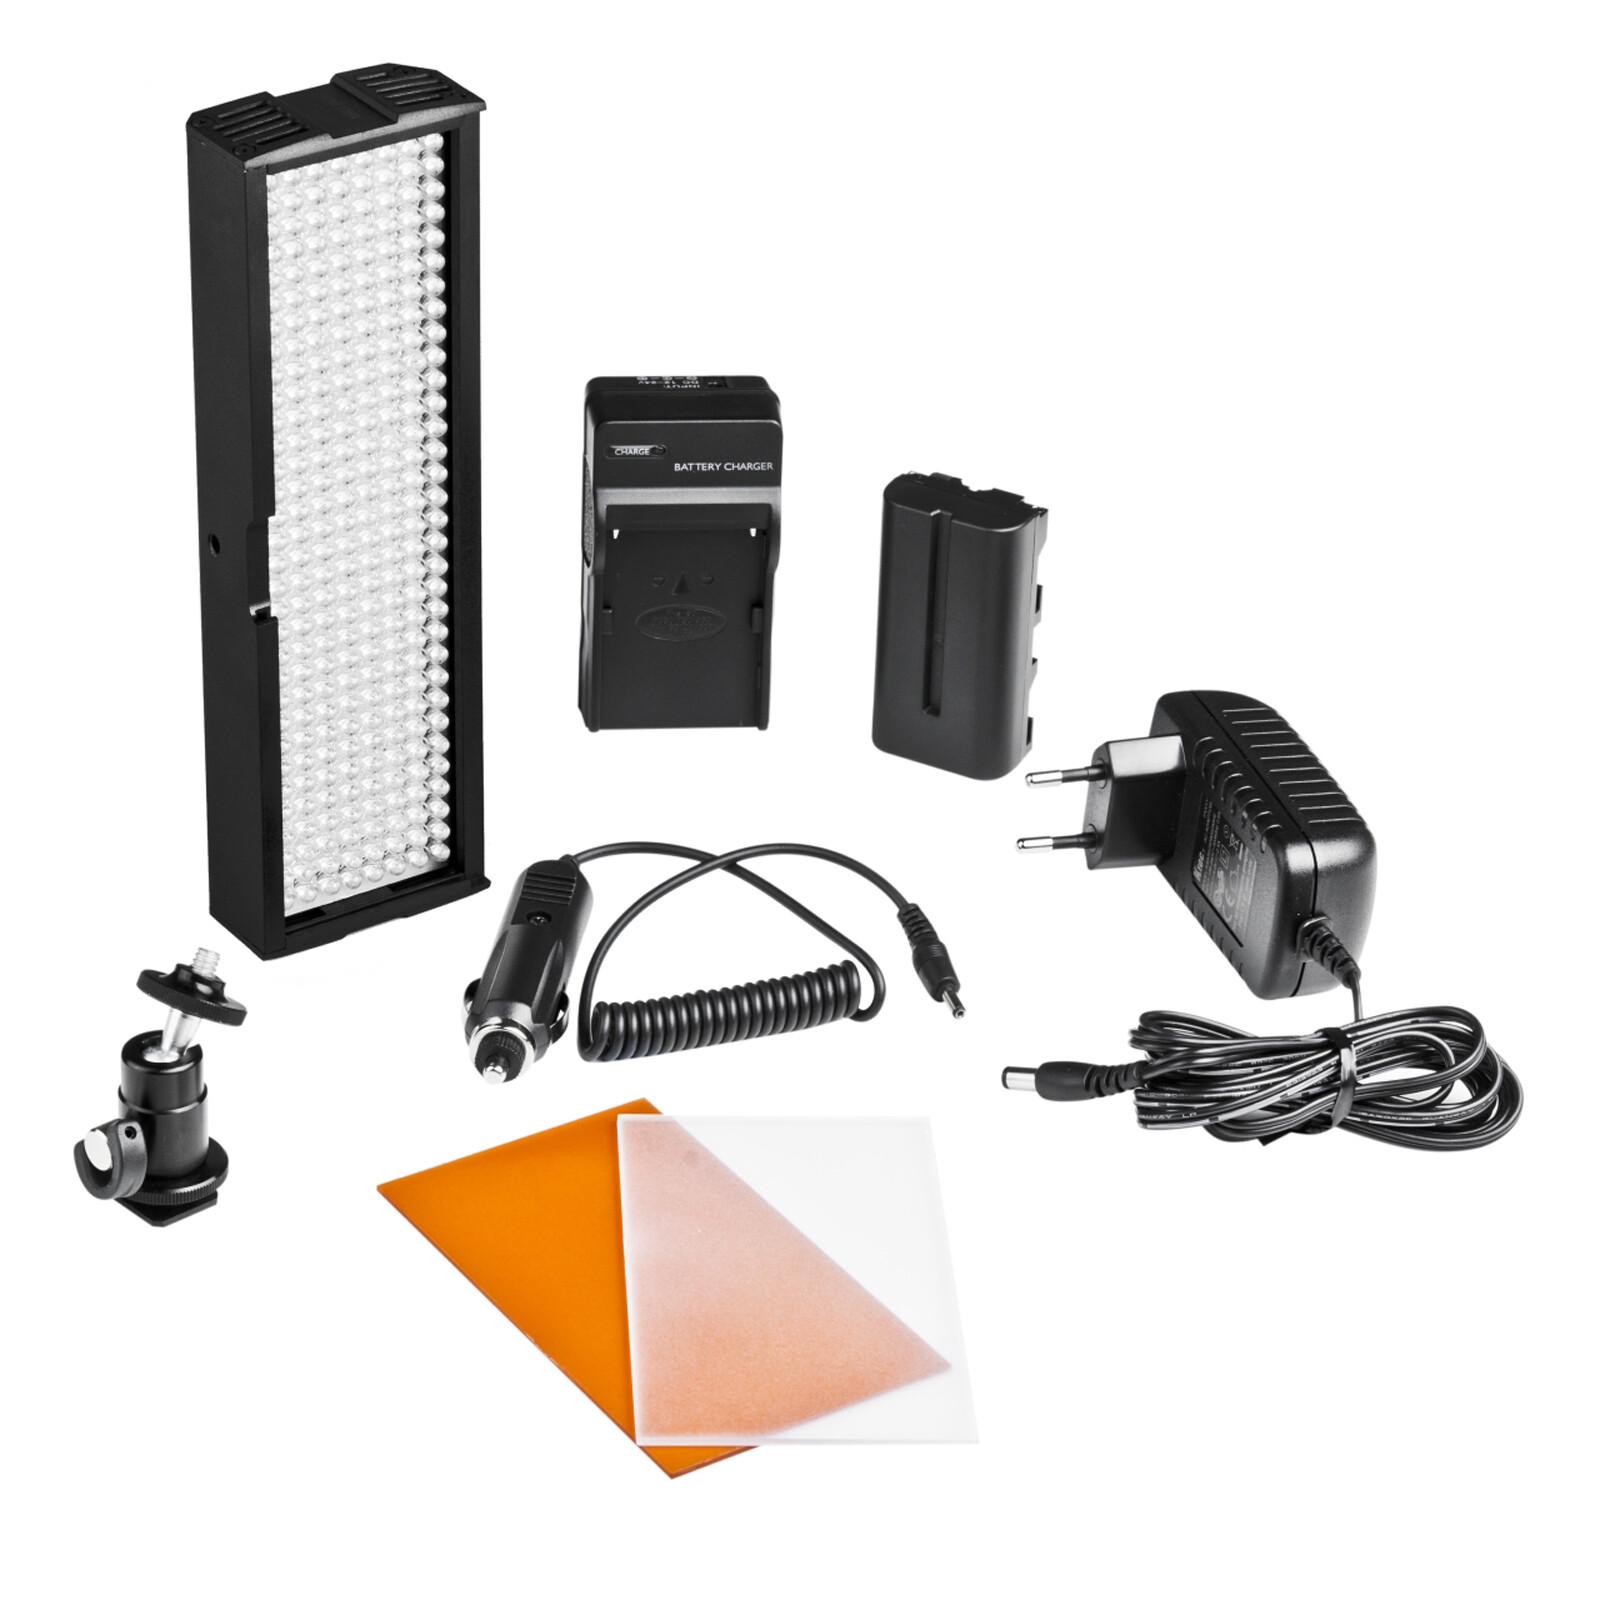 walimex pro LED-Videoleuchte mit 256 LED